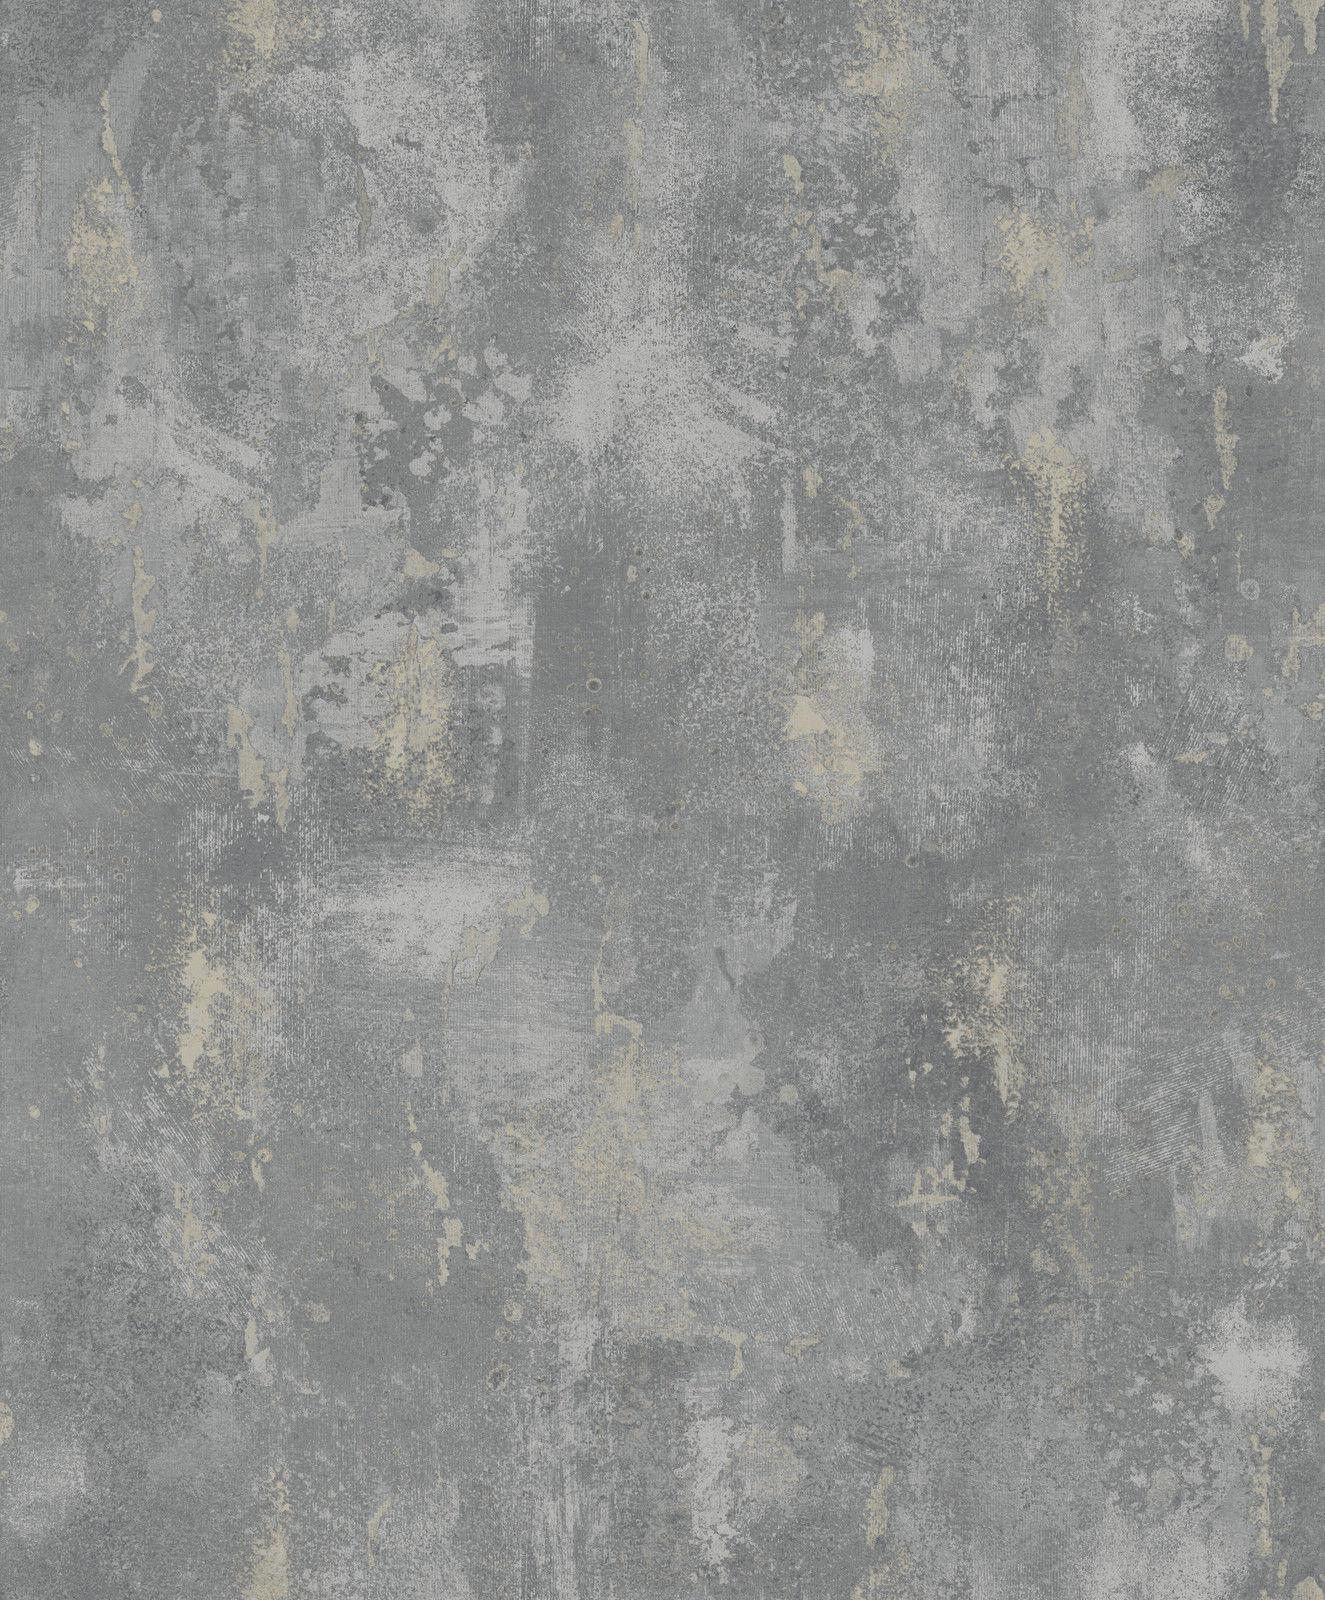 Vliestapete stein optik patina anthrazit grau gold 1008 for Tapeten in gold optik